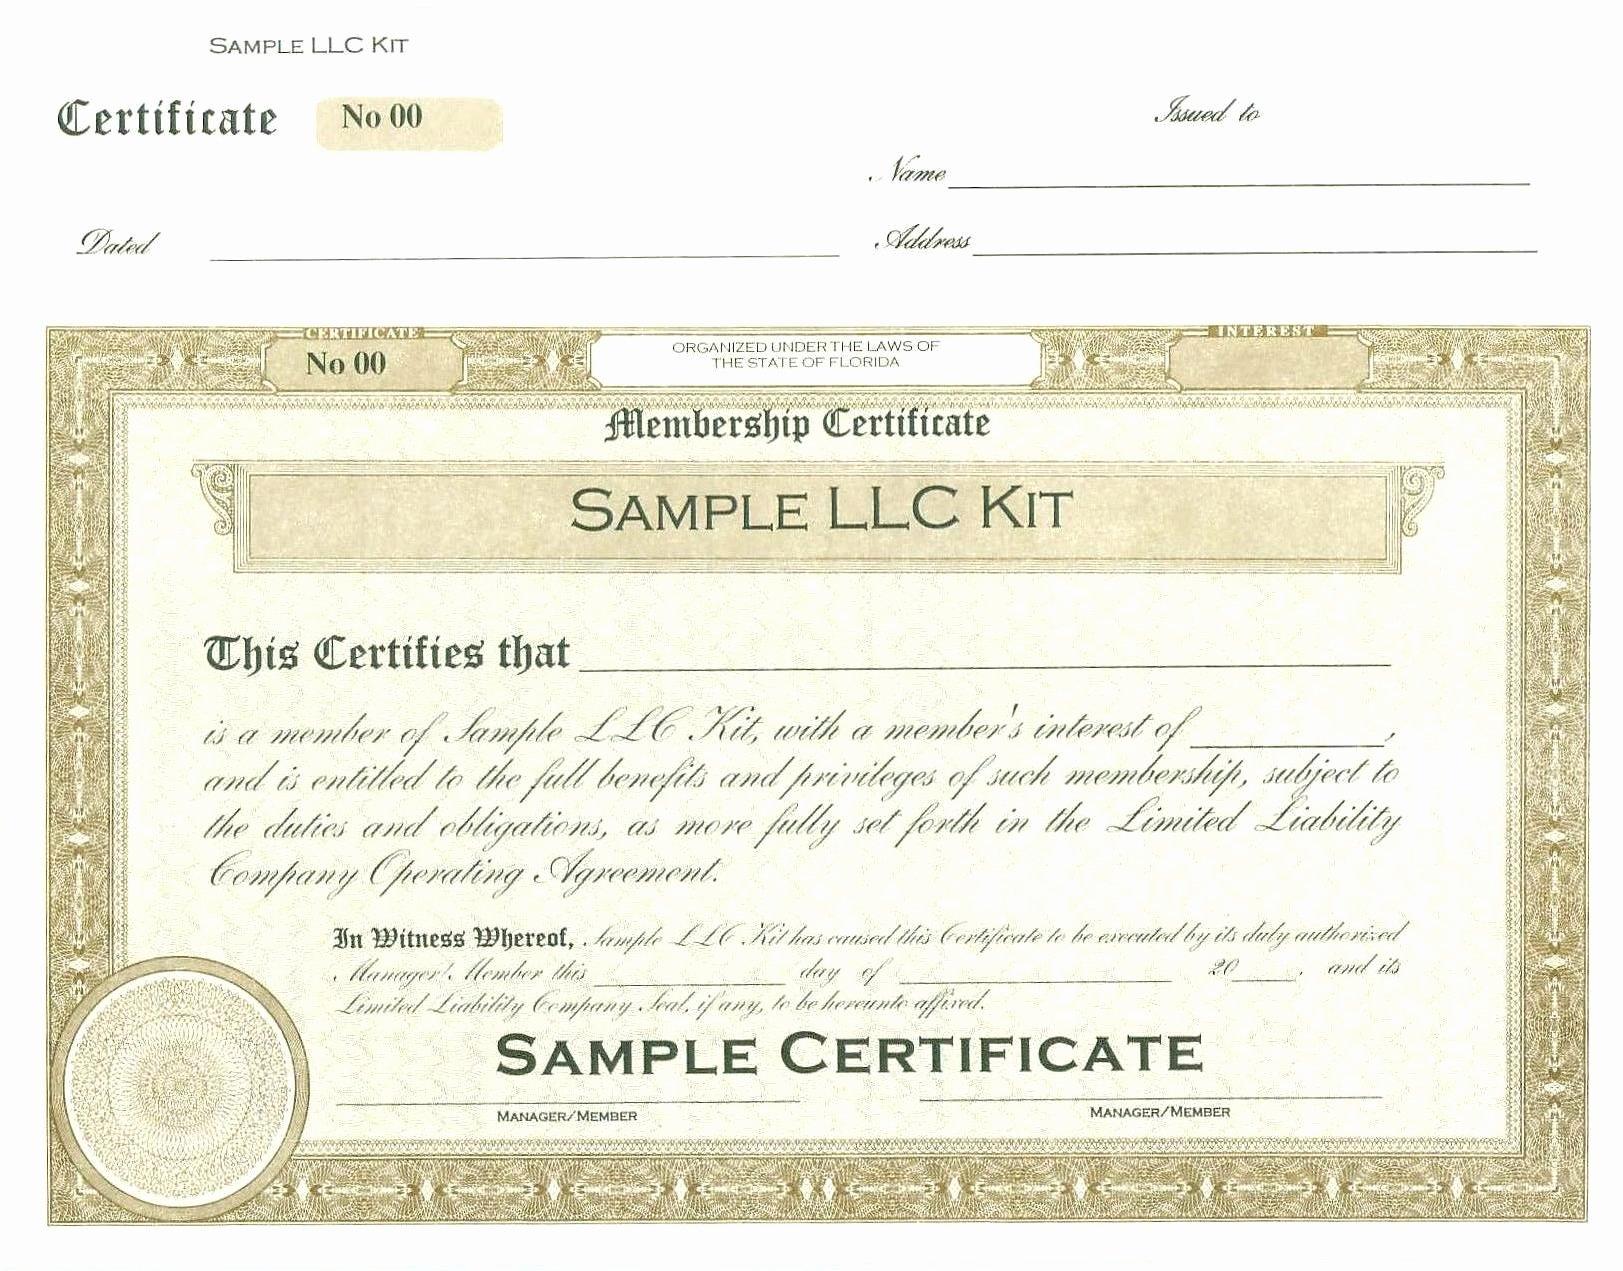 Llc Membership Certificate Template Beautiful Index Of Cdn 26 2004 663